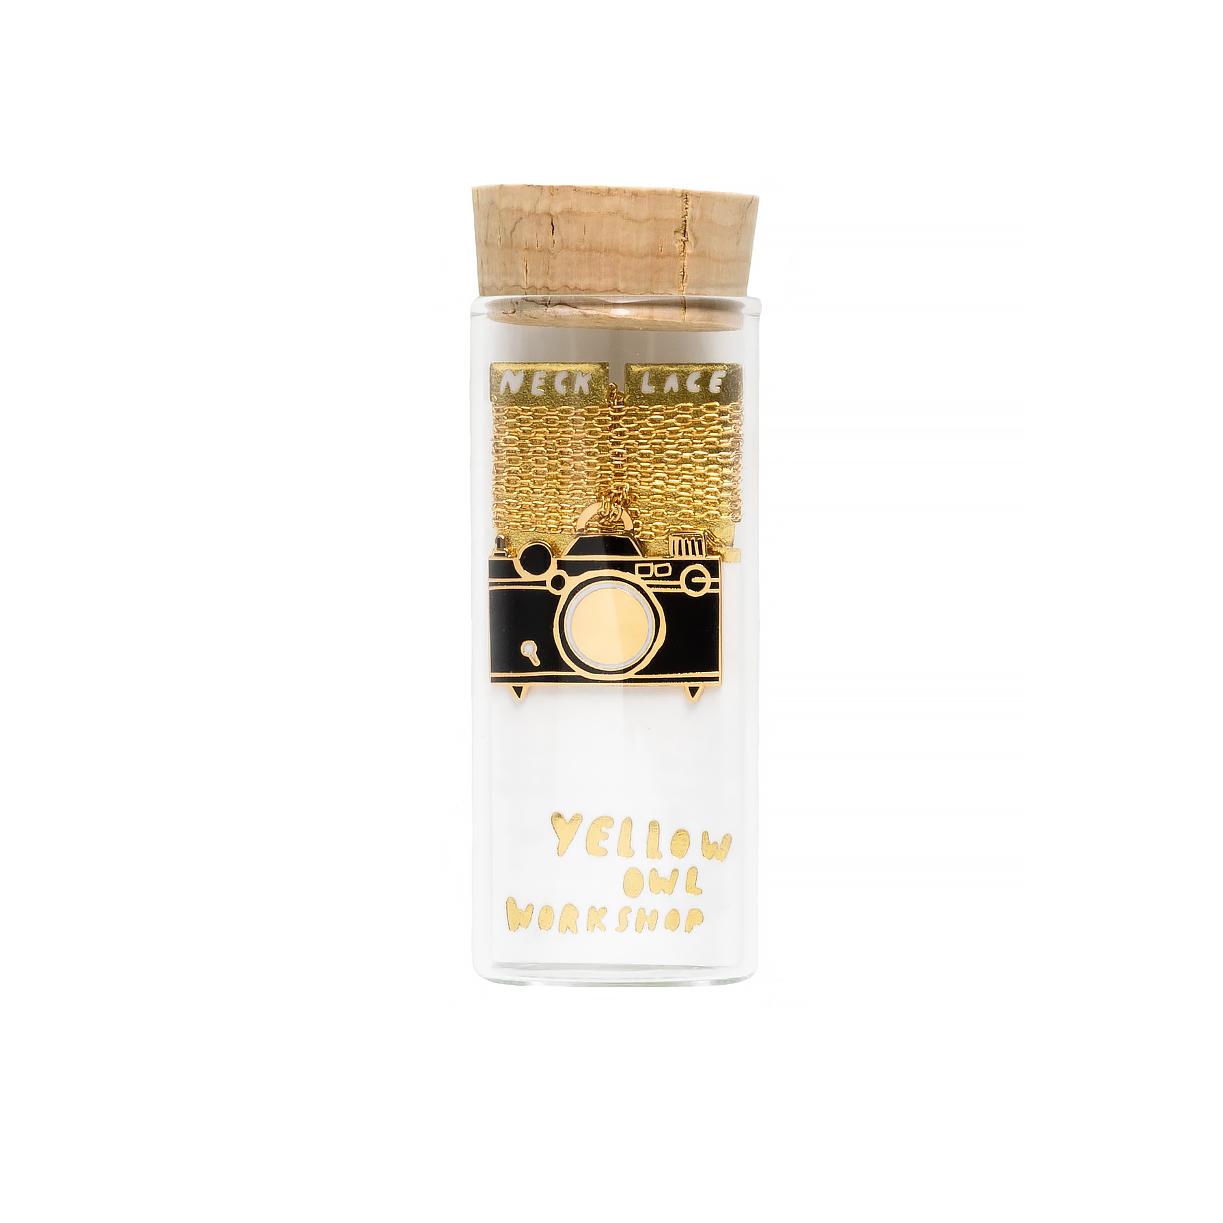 Yellow Owl Workshop Yellow Owl Workshop Necklace - Camera